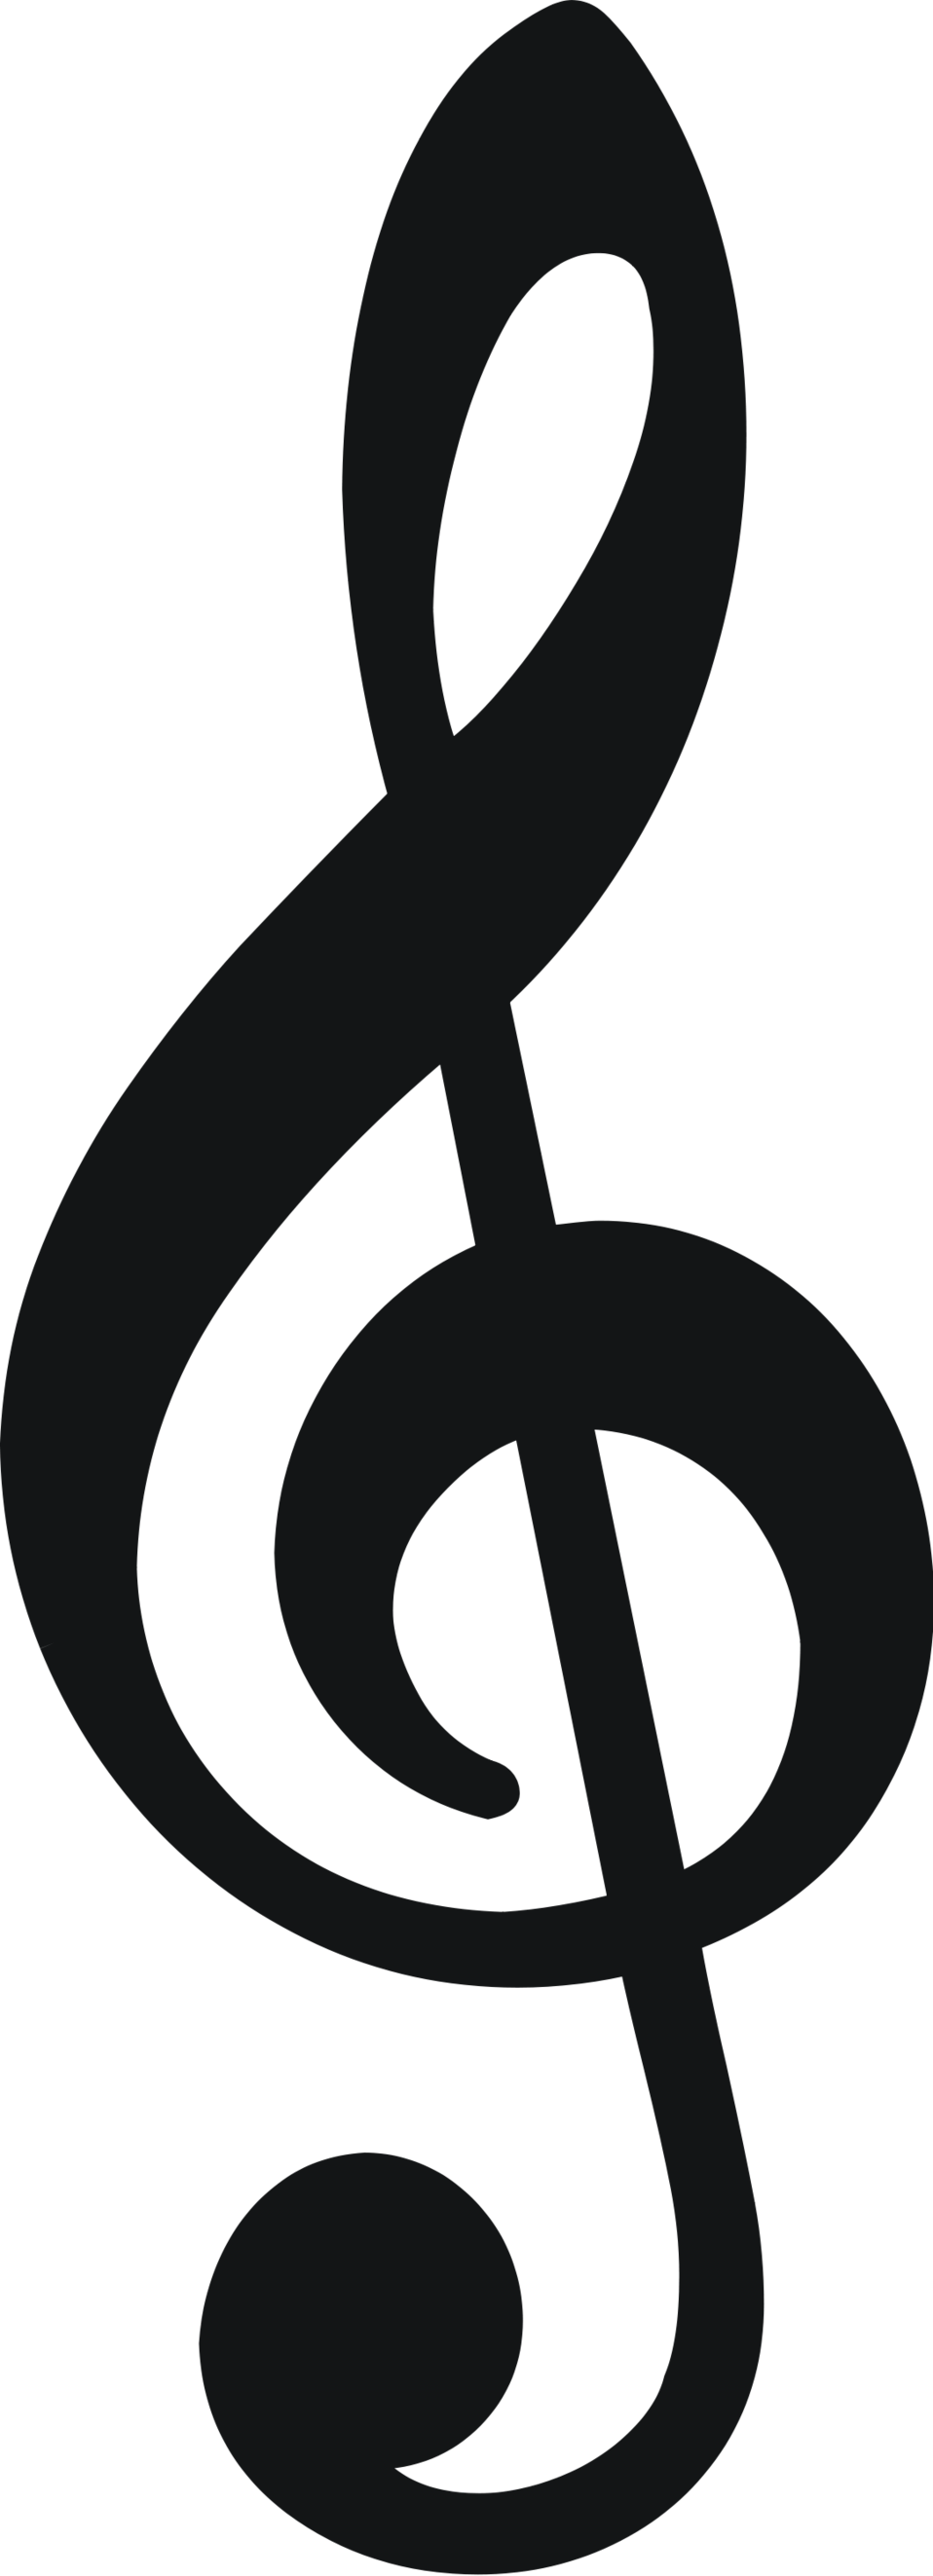 Free stock photos illustration. Clipart music laptop